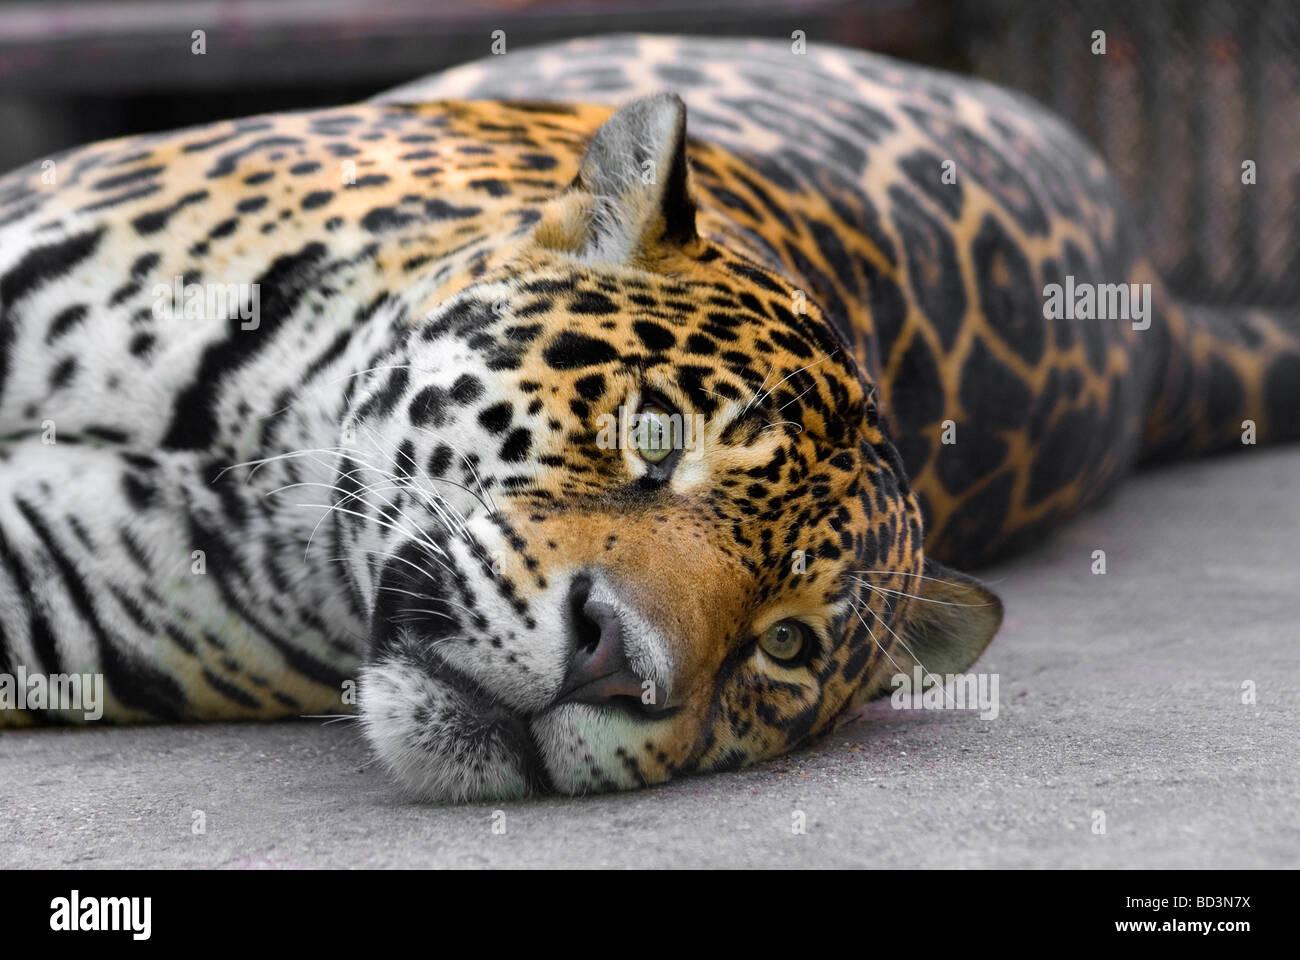 Lolling leopard - Stock Image